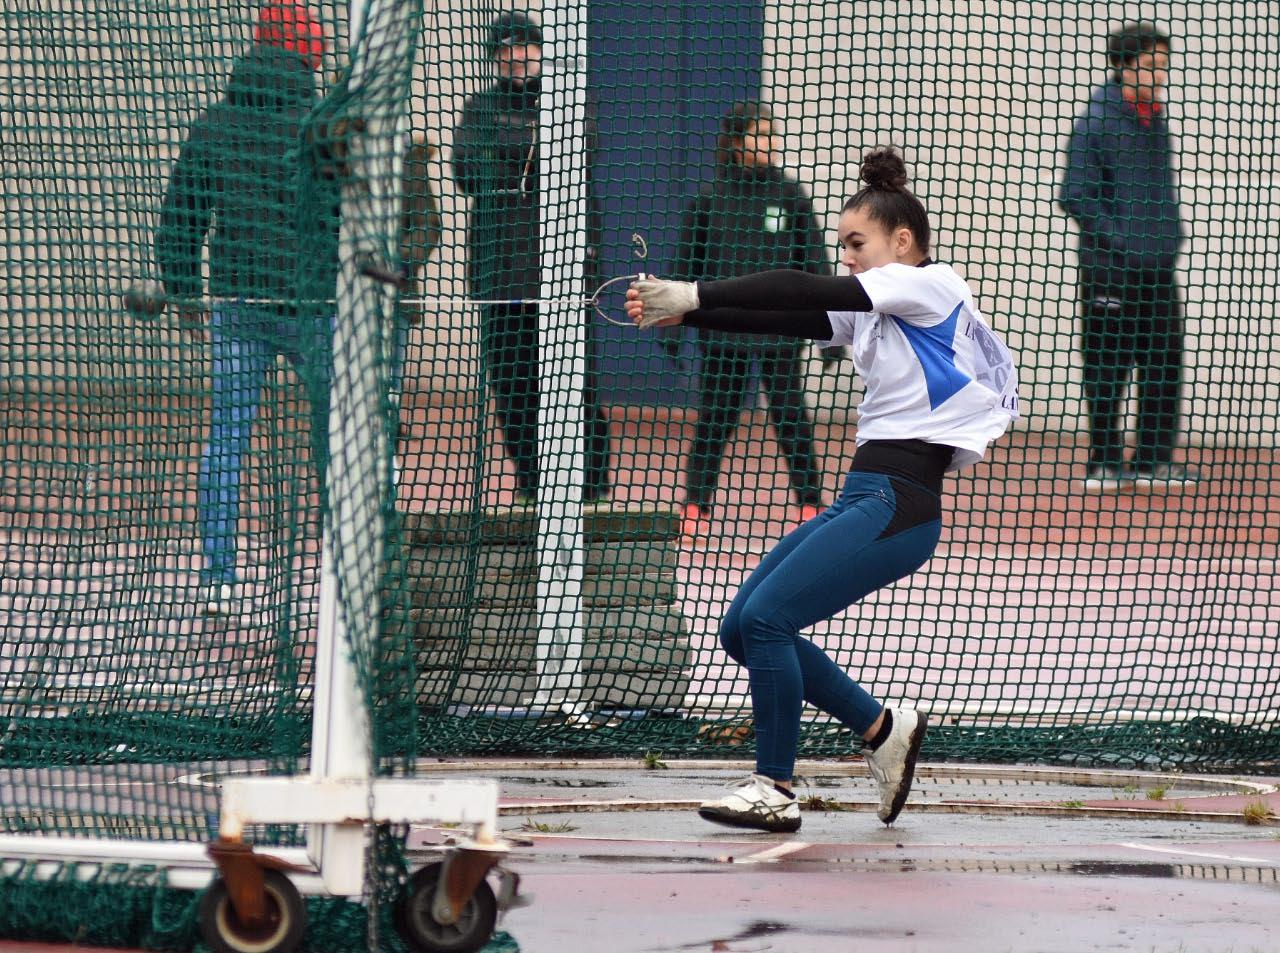 16-12 Arantza Izagguirre Martillo JV F_5